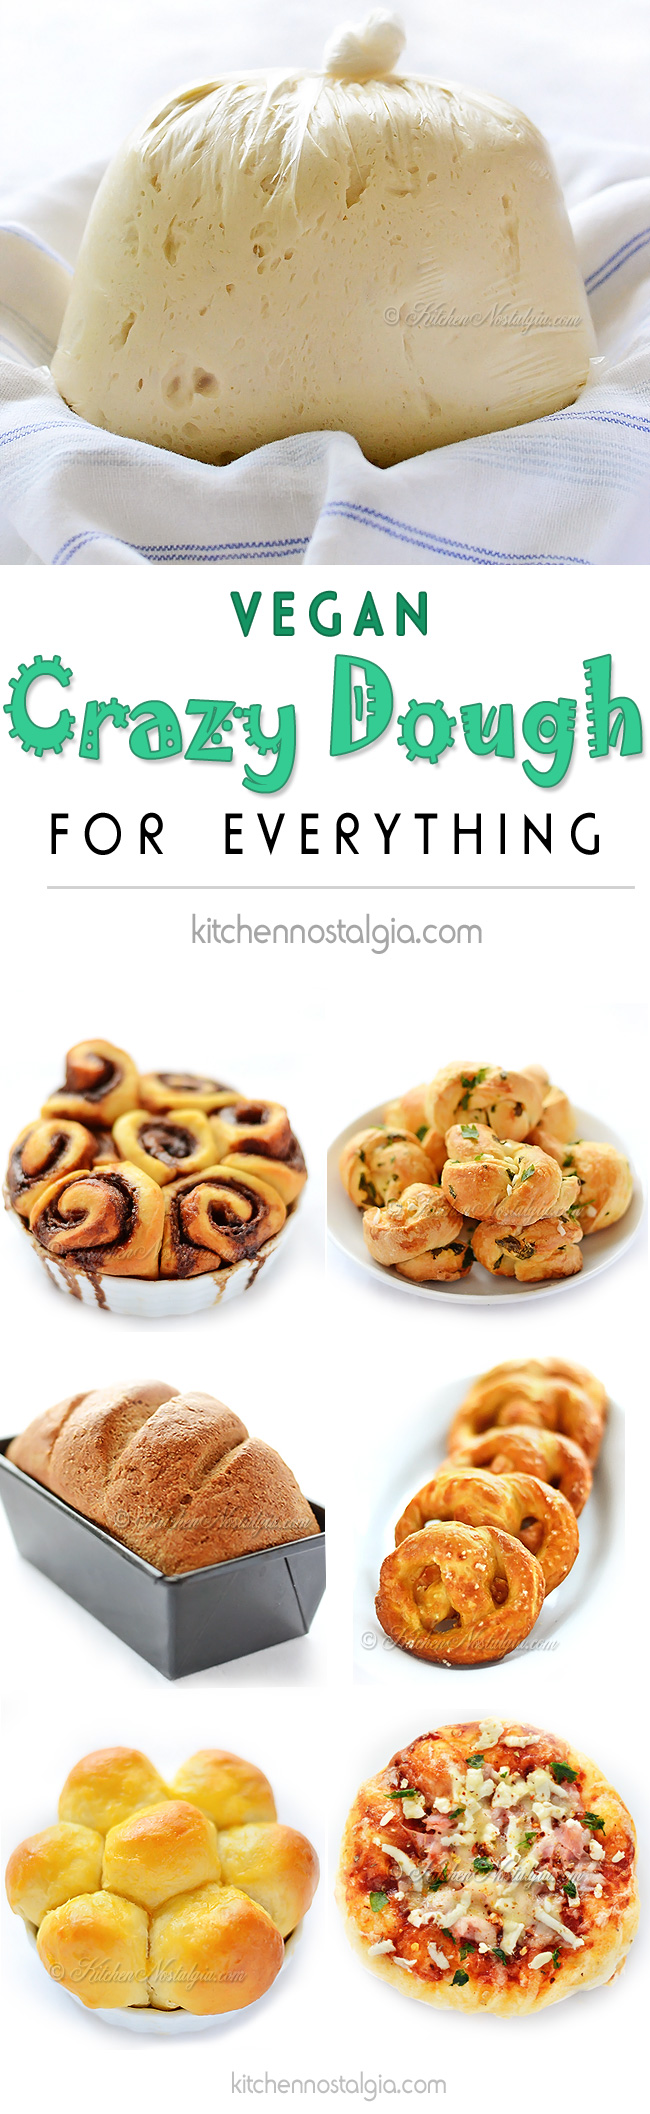 Vegan Crazy Dough | Kitchen Nostalgia